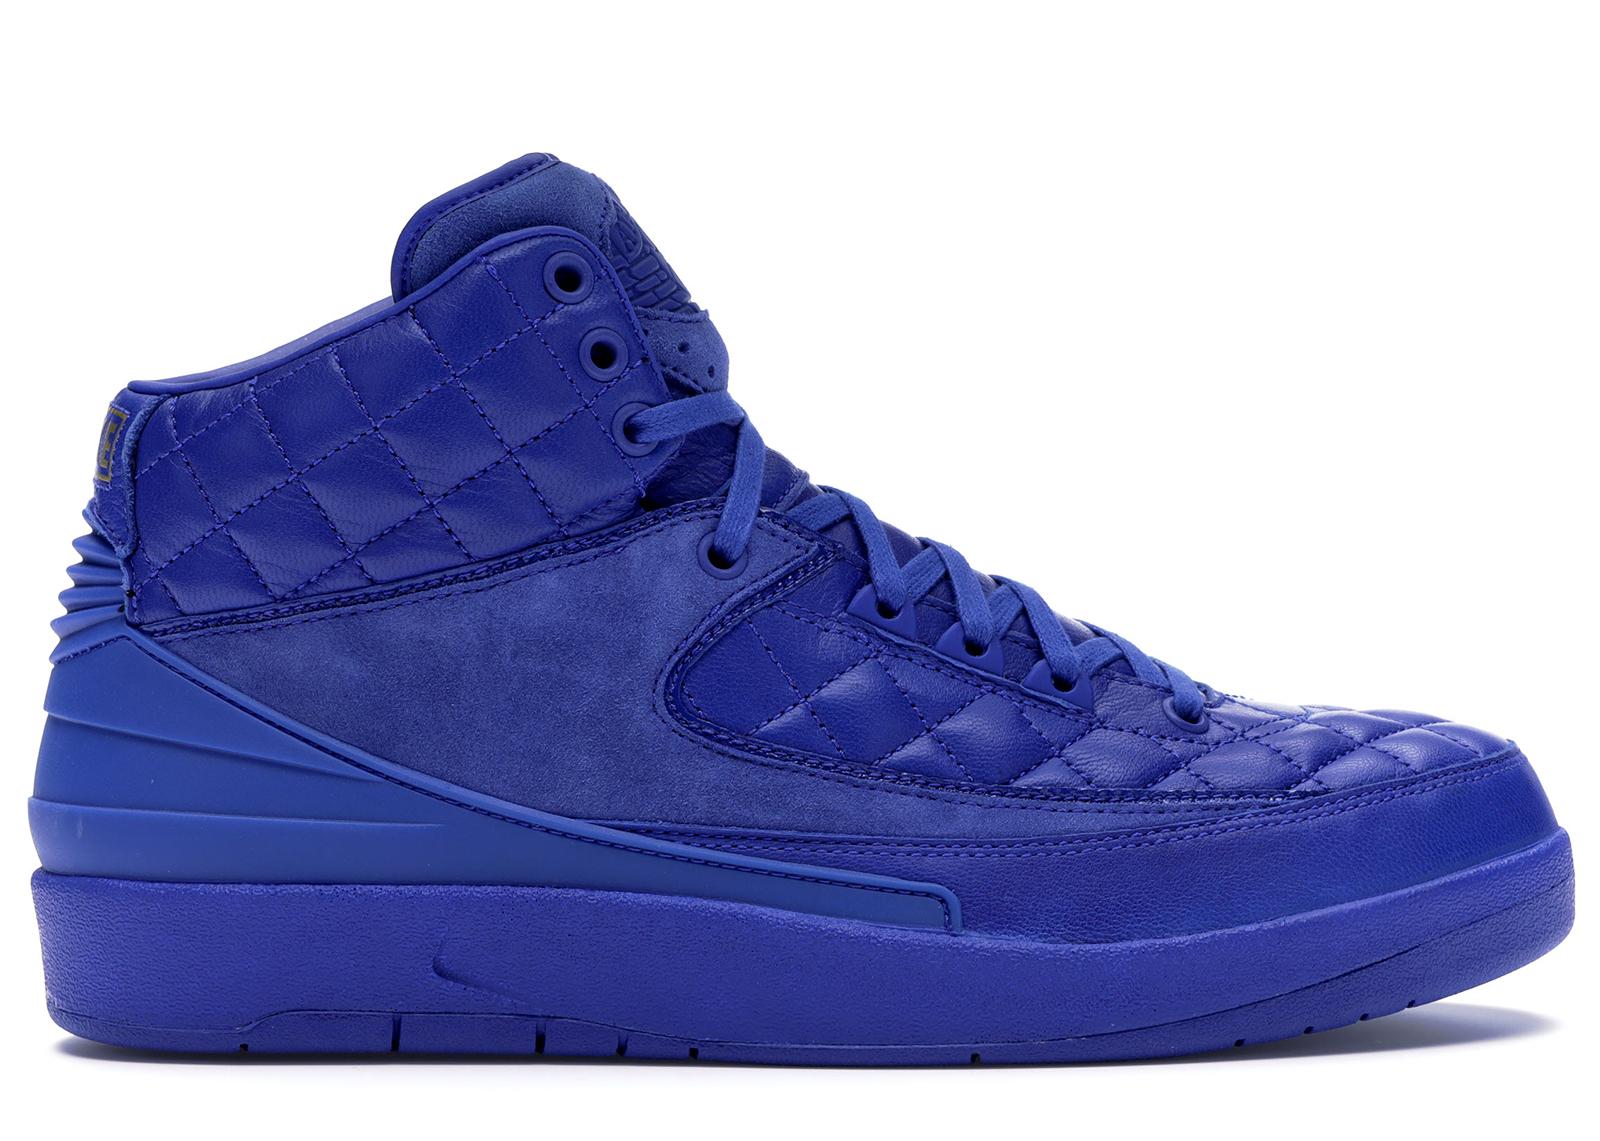 Jordan 2 Retro Just Don Blue - 717170-405